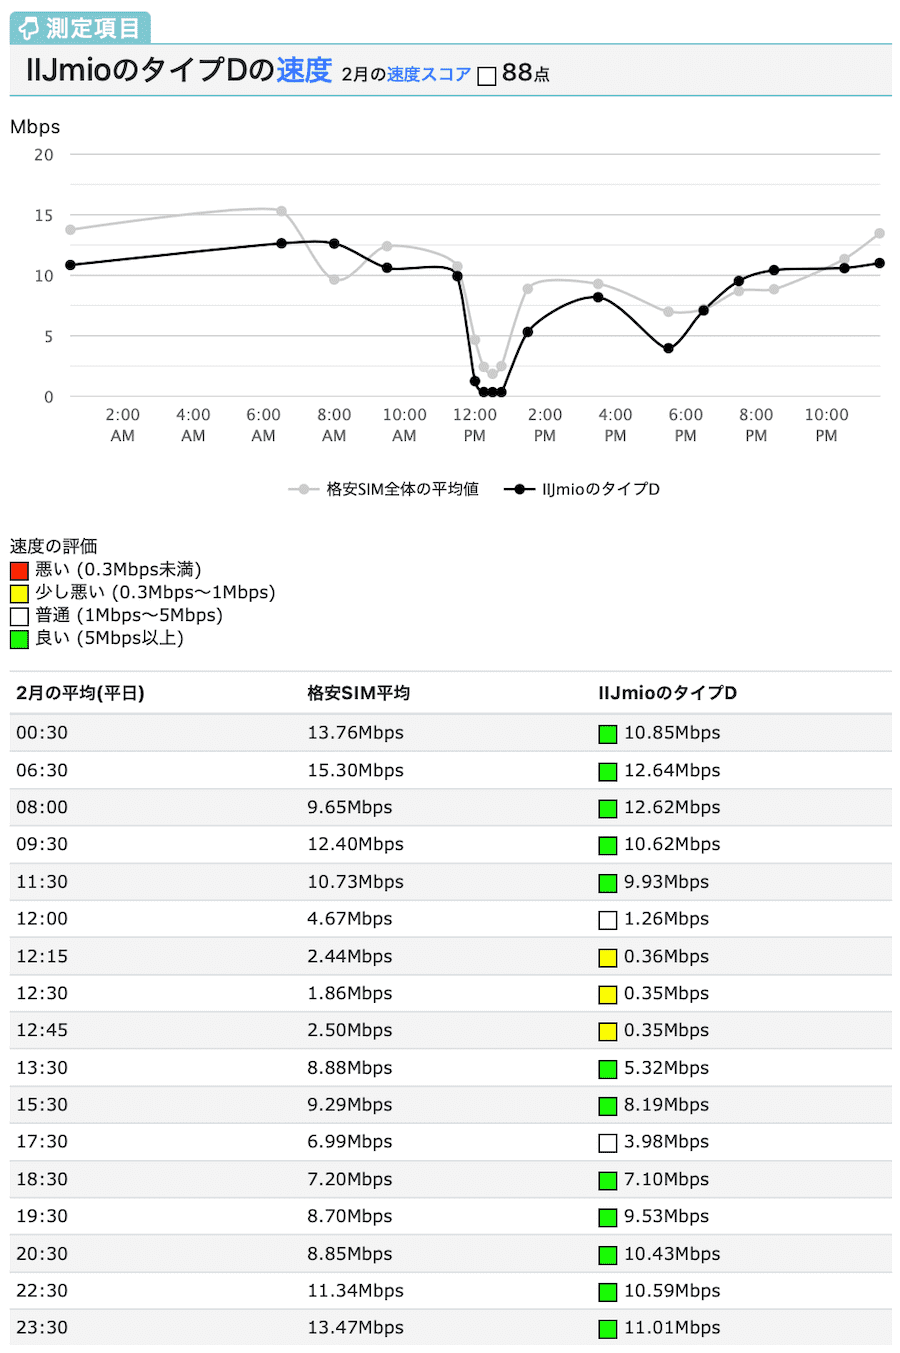 IIJmioのドコモ回線の速度